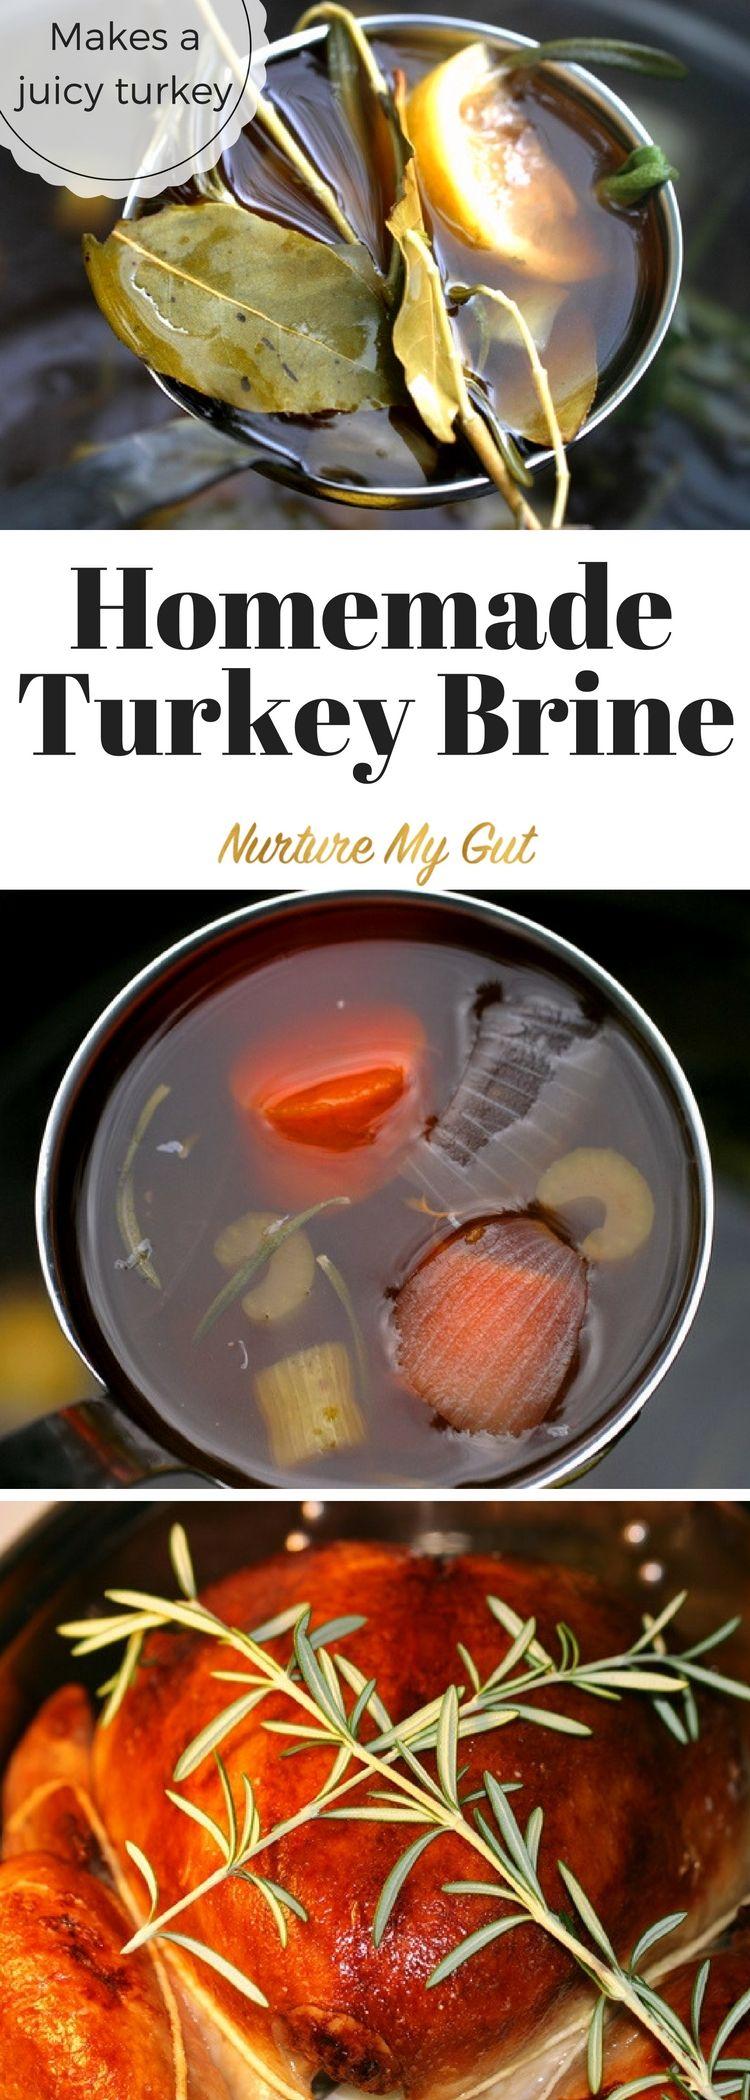 Homemade Turkey Brine Recipe